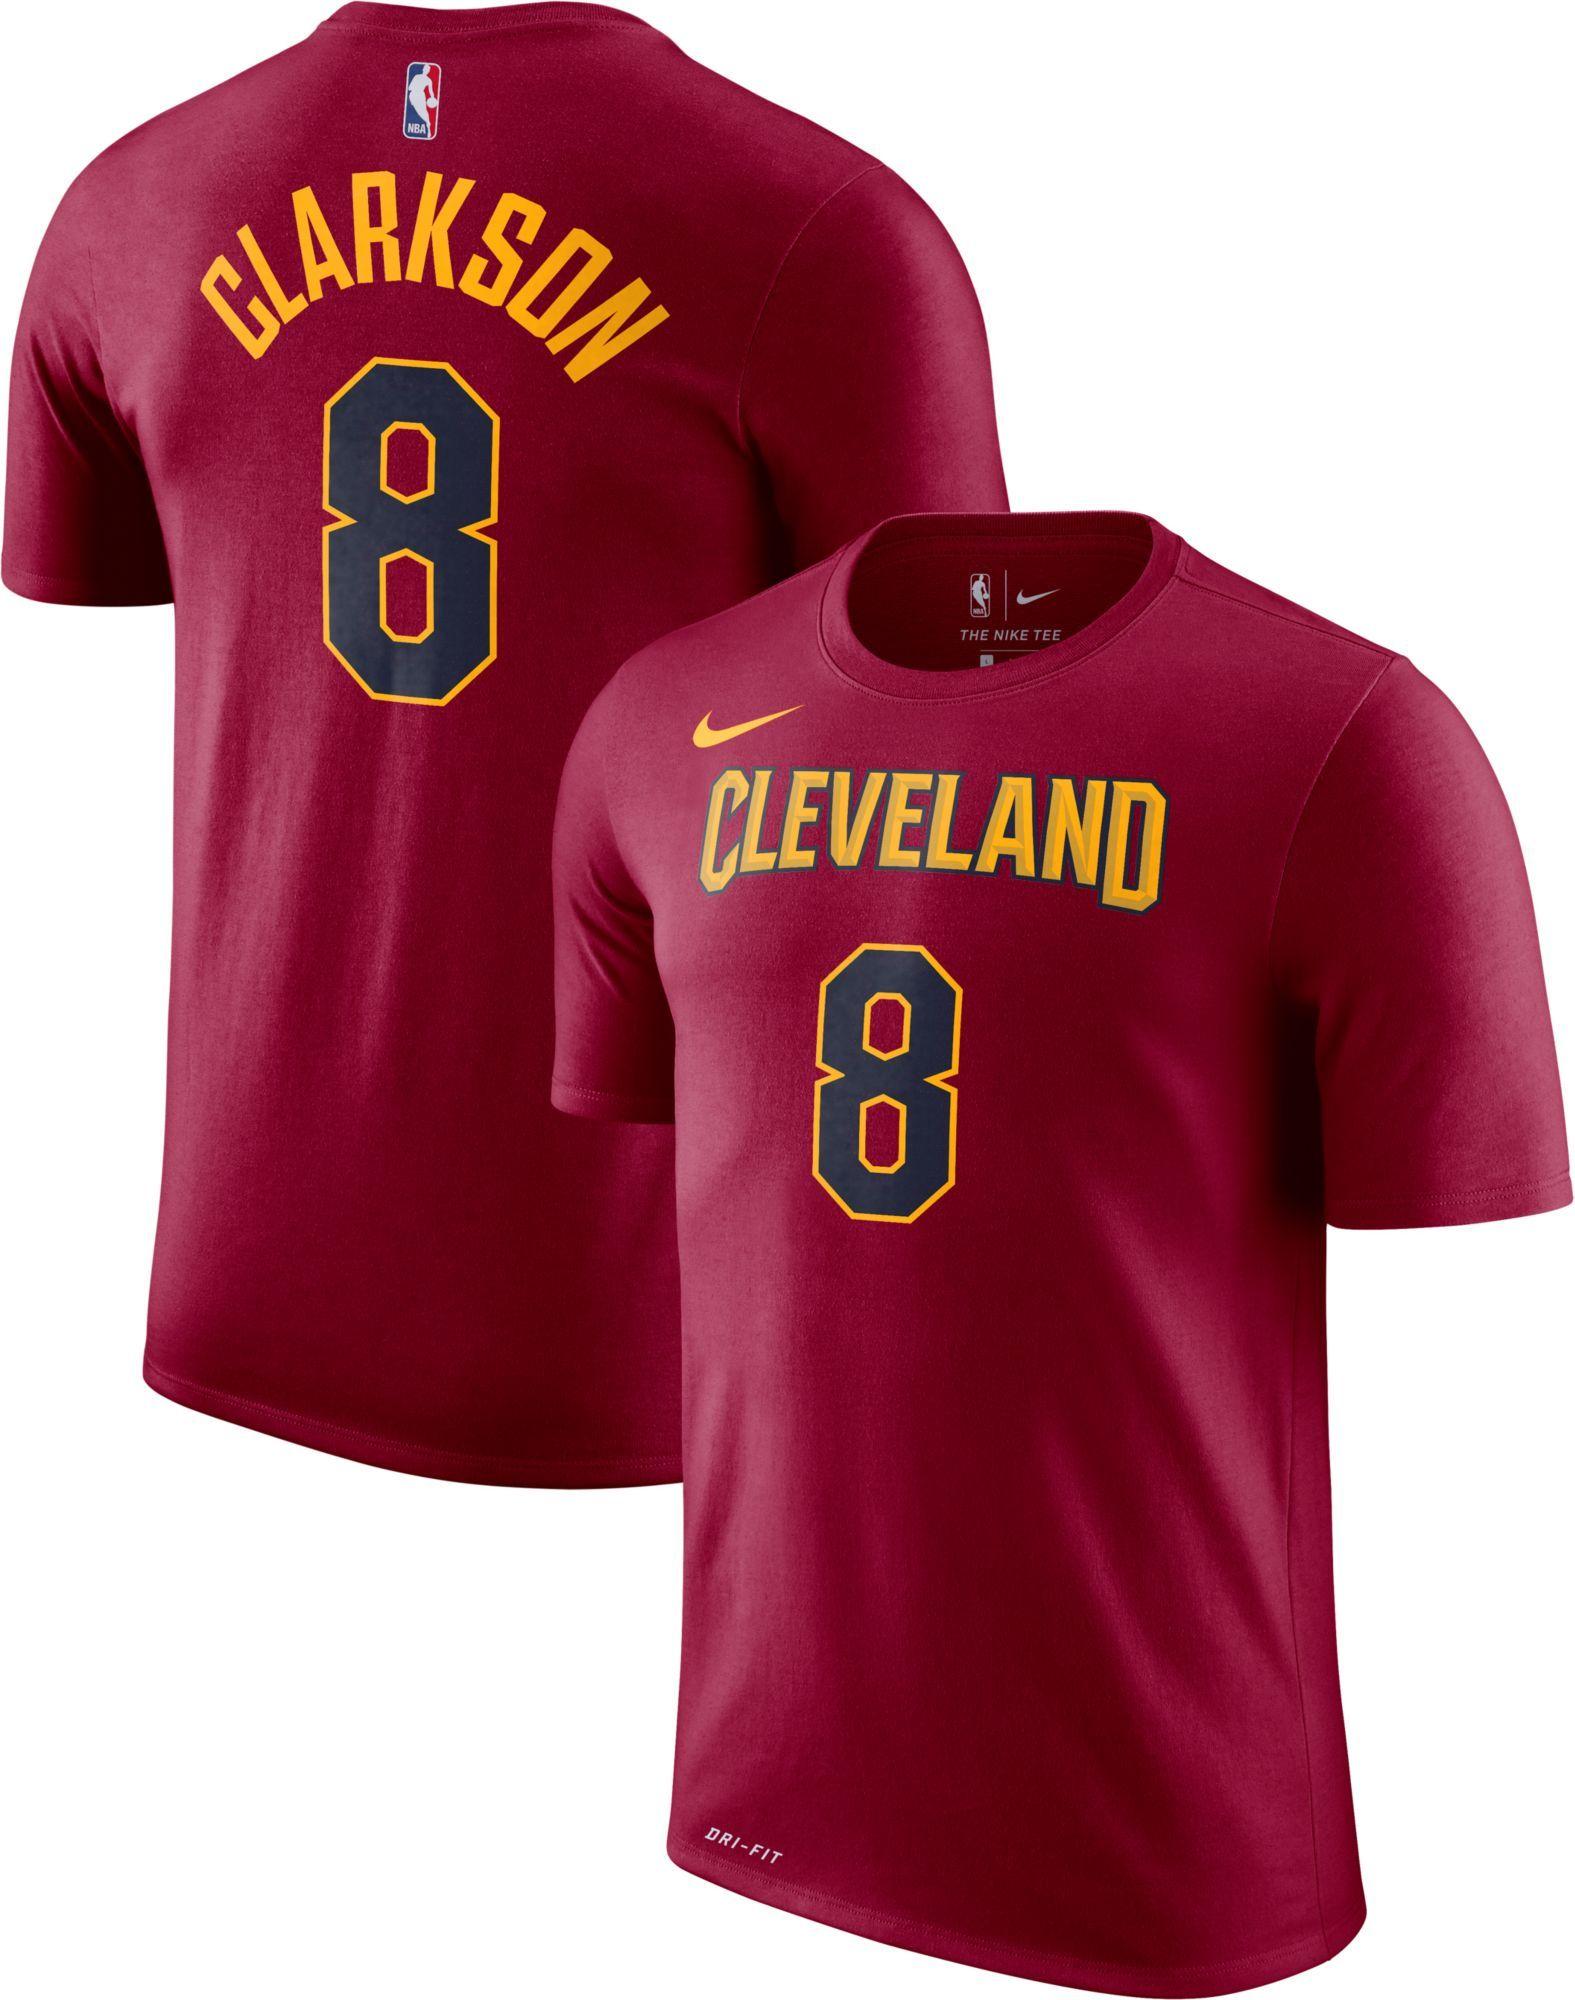 8d795b4d7f6 Nike Youth Cleveland Cavaliers Jordan Clarkson #8 Dri-FIT Burgundy T-Shirt,  Boy's, Size: Medium, Red